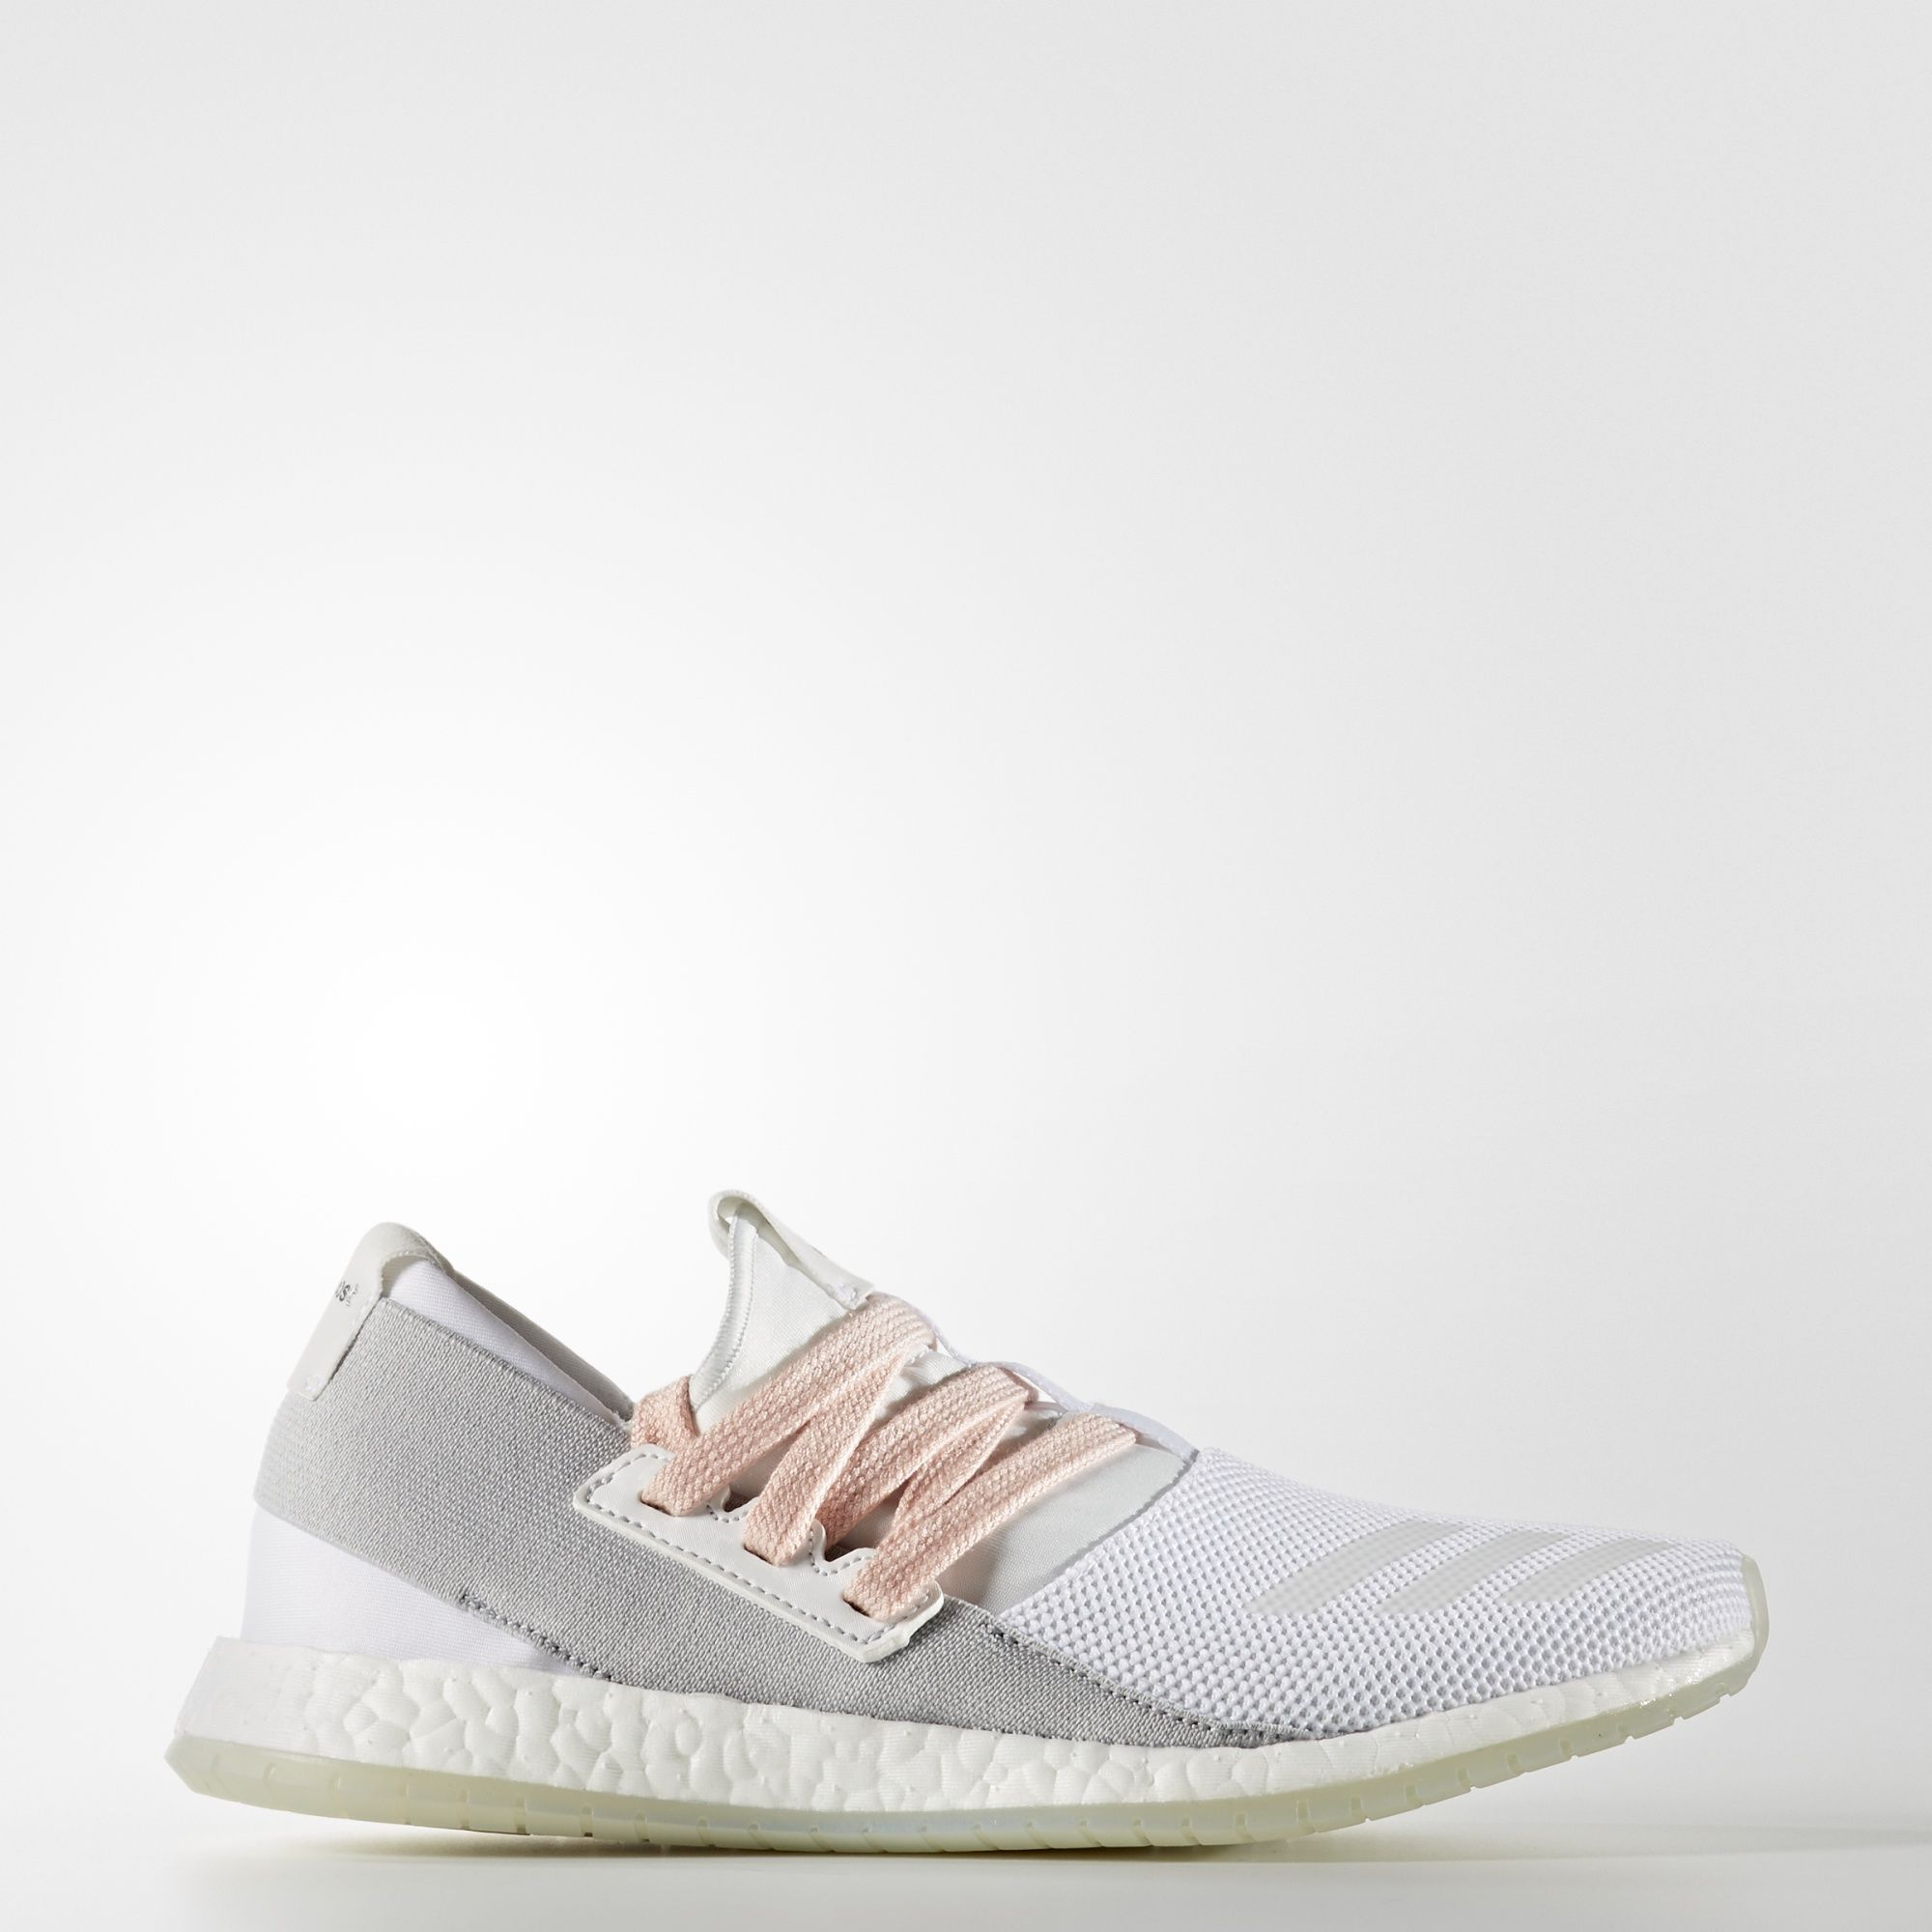 adidas - Pure Boost R Shoes  c9e70b54f